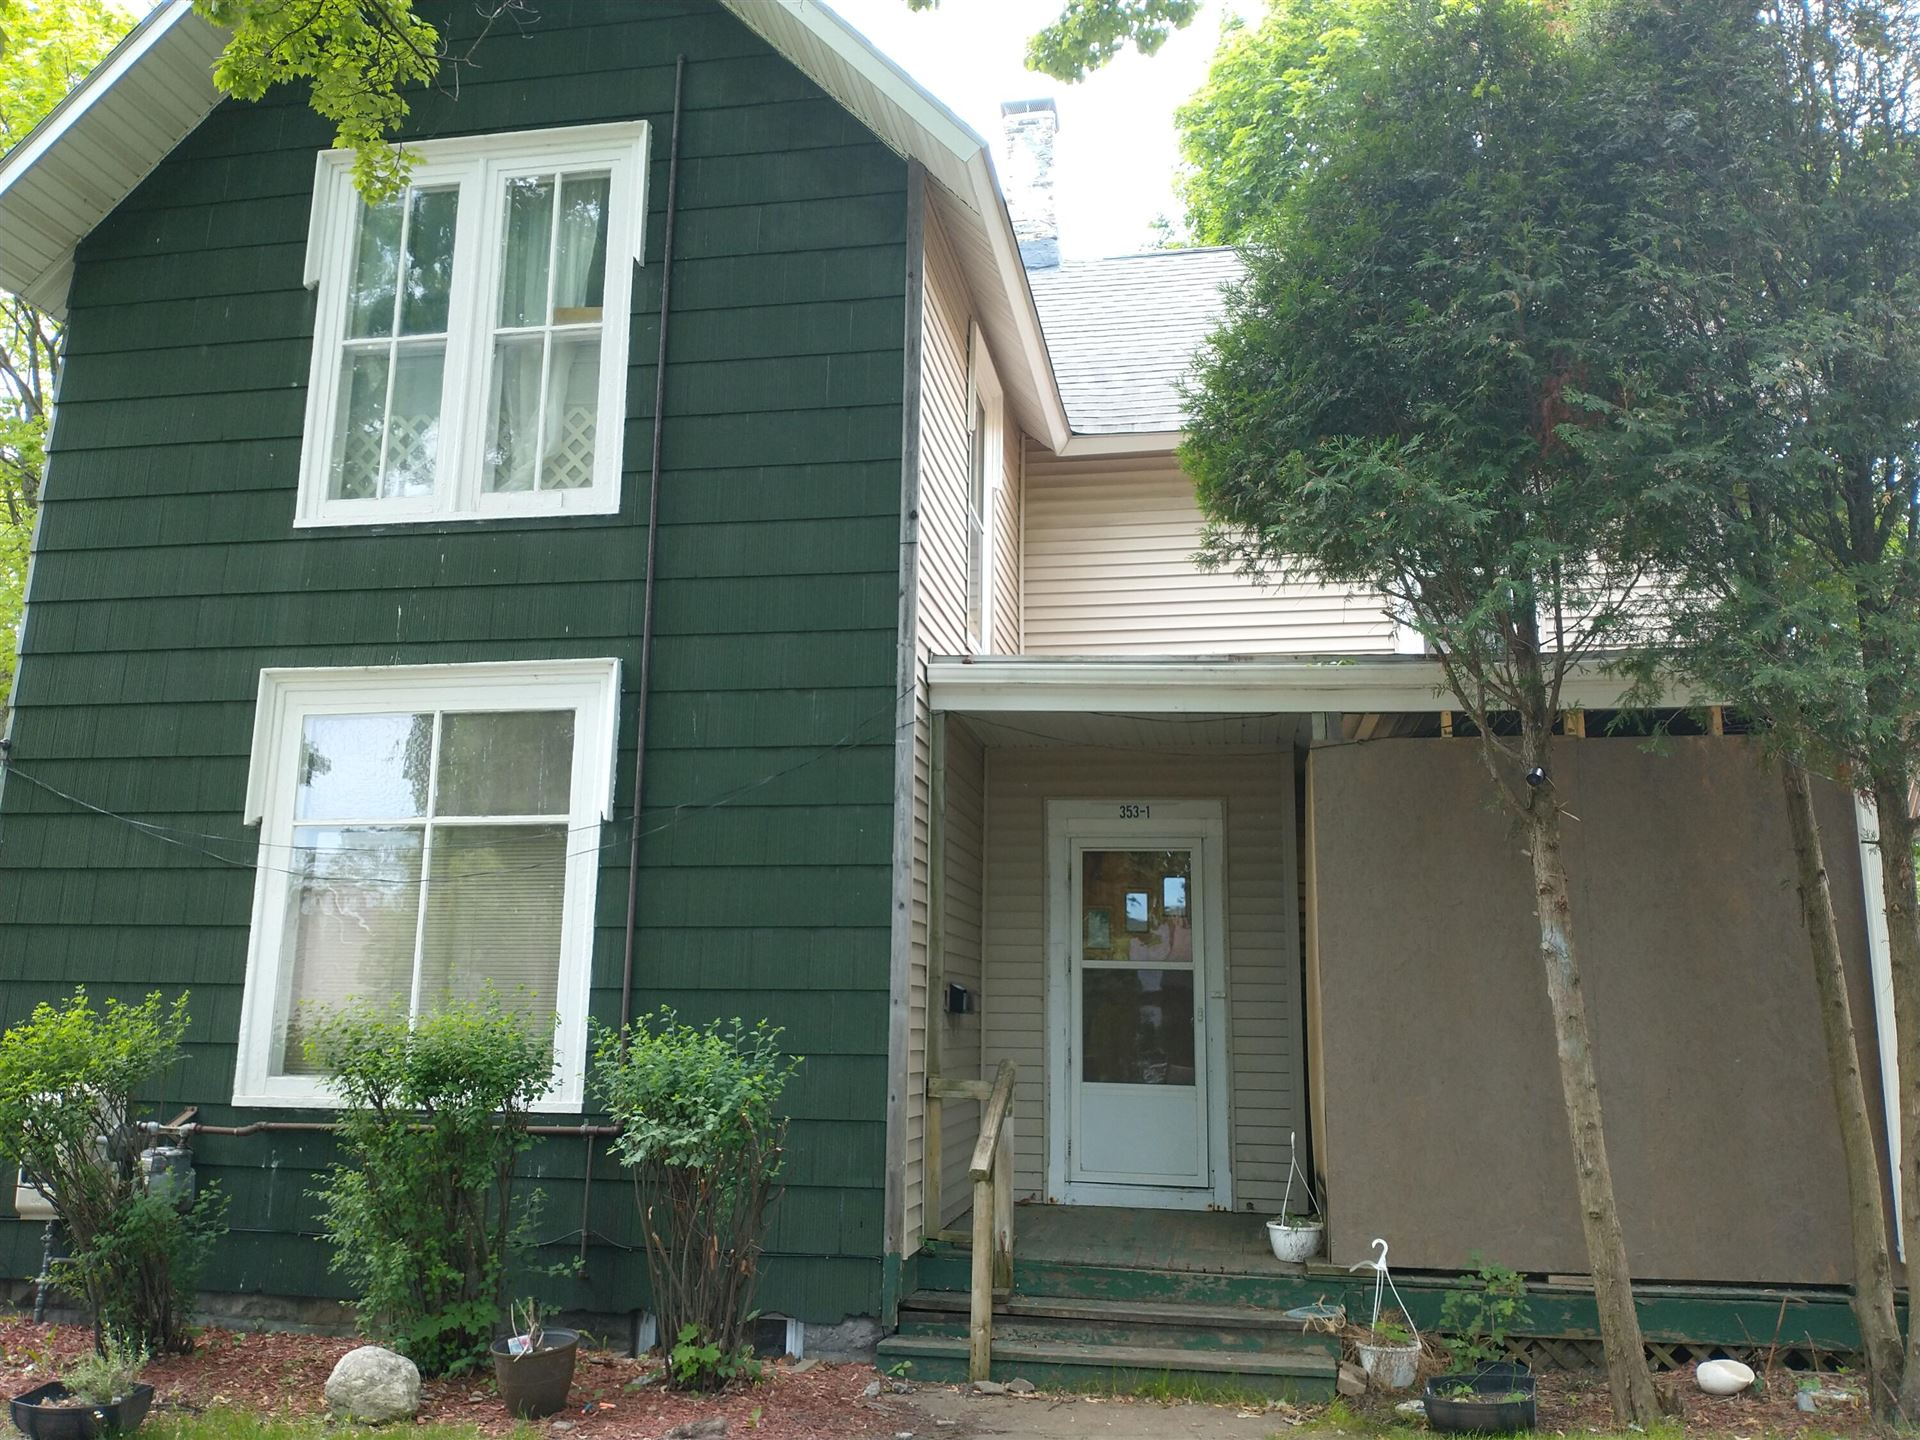 353 2nd Street, Manistee, MI 49660 - MLS#: 21021447